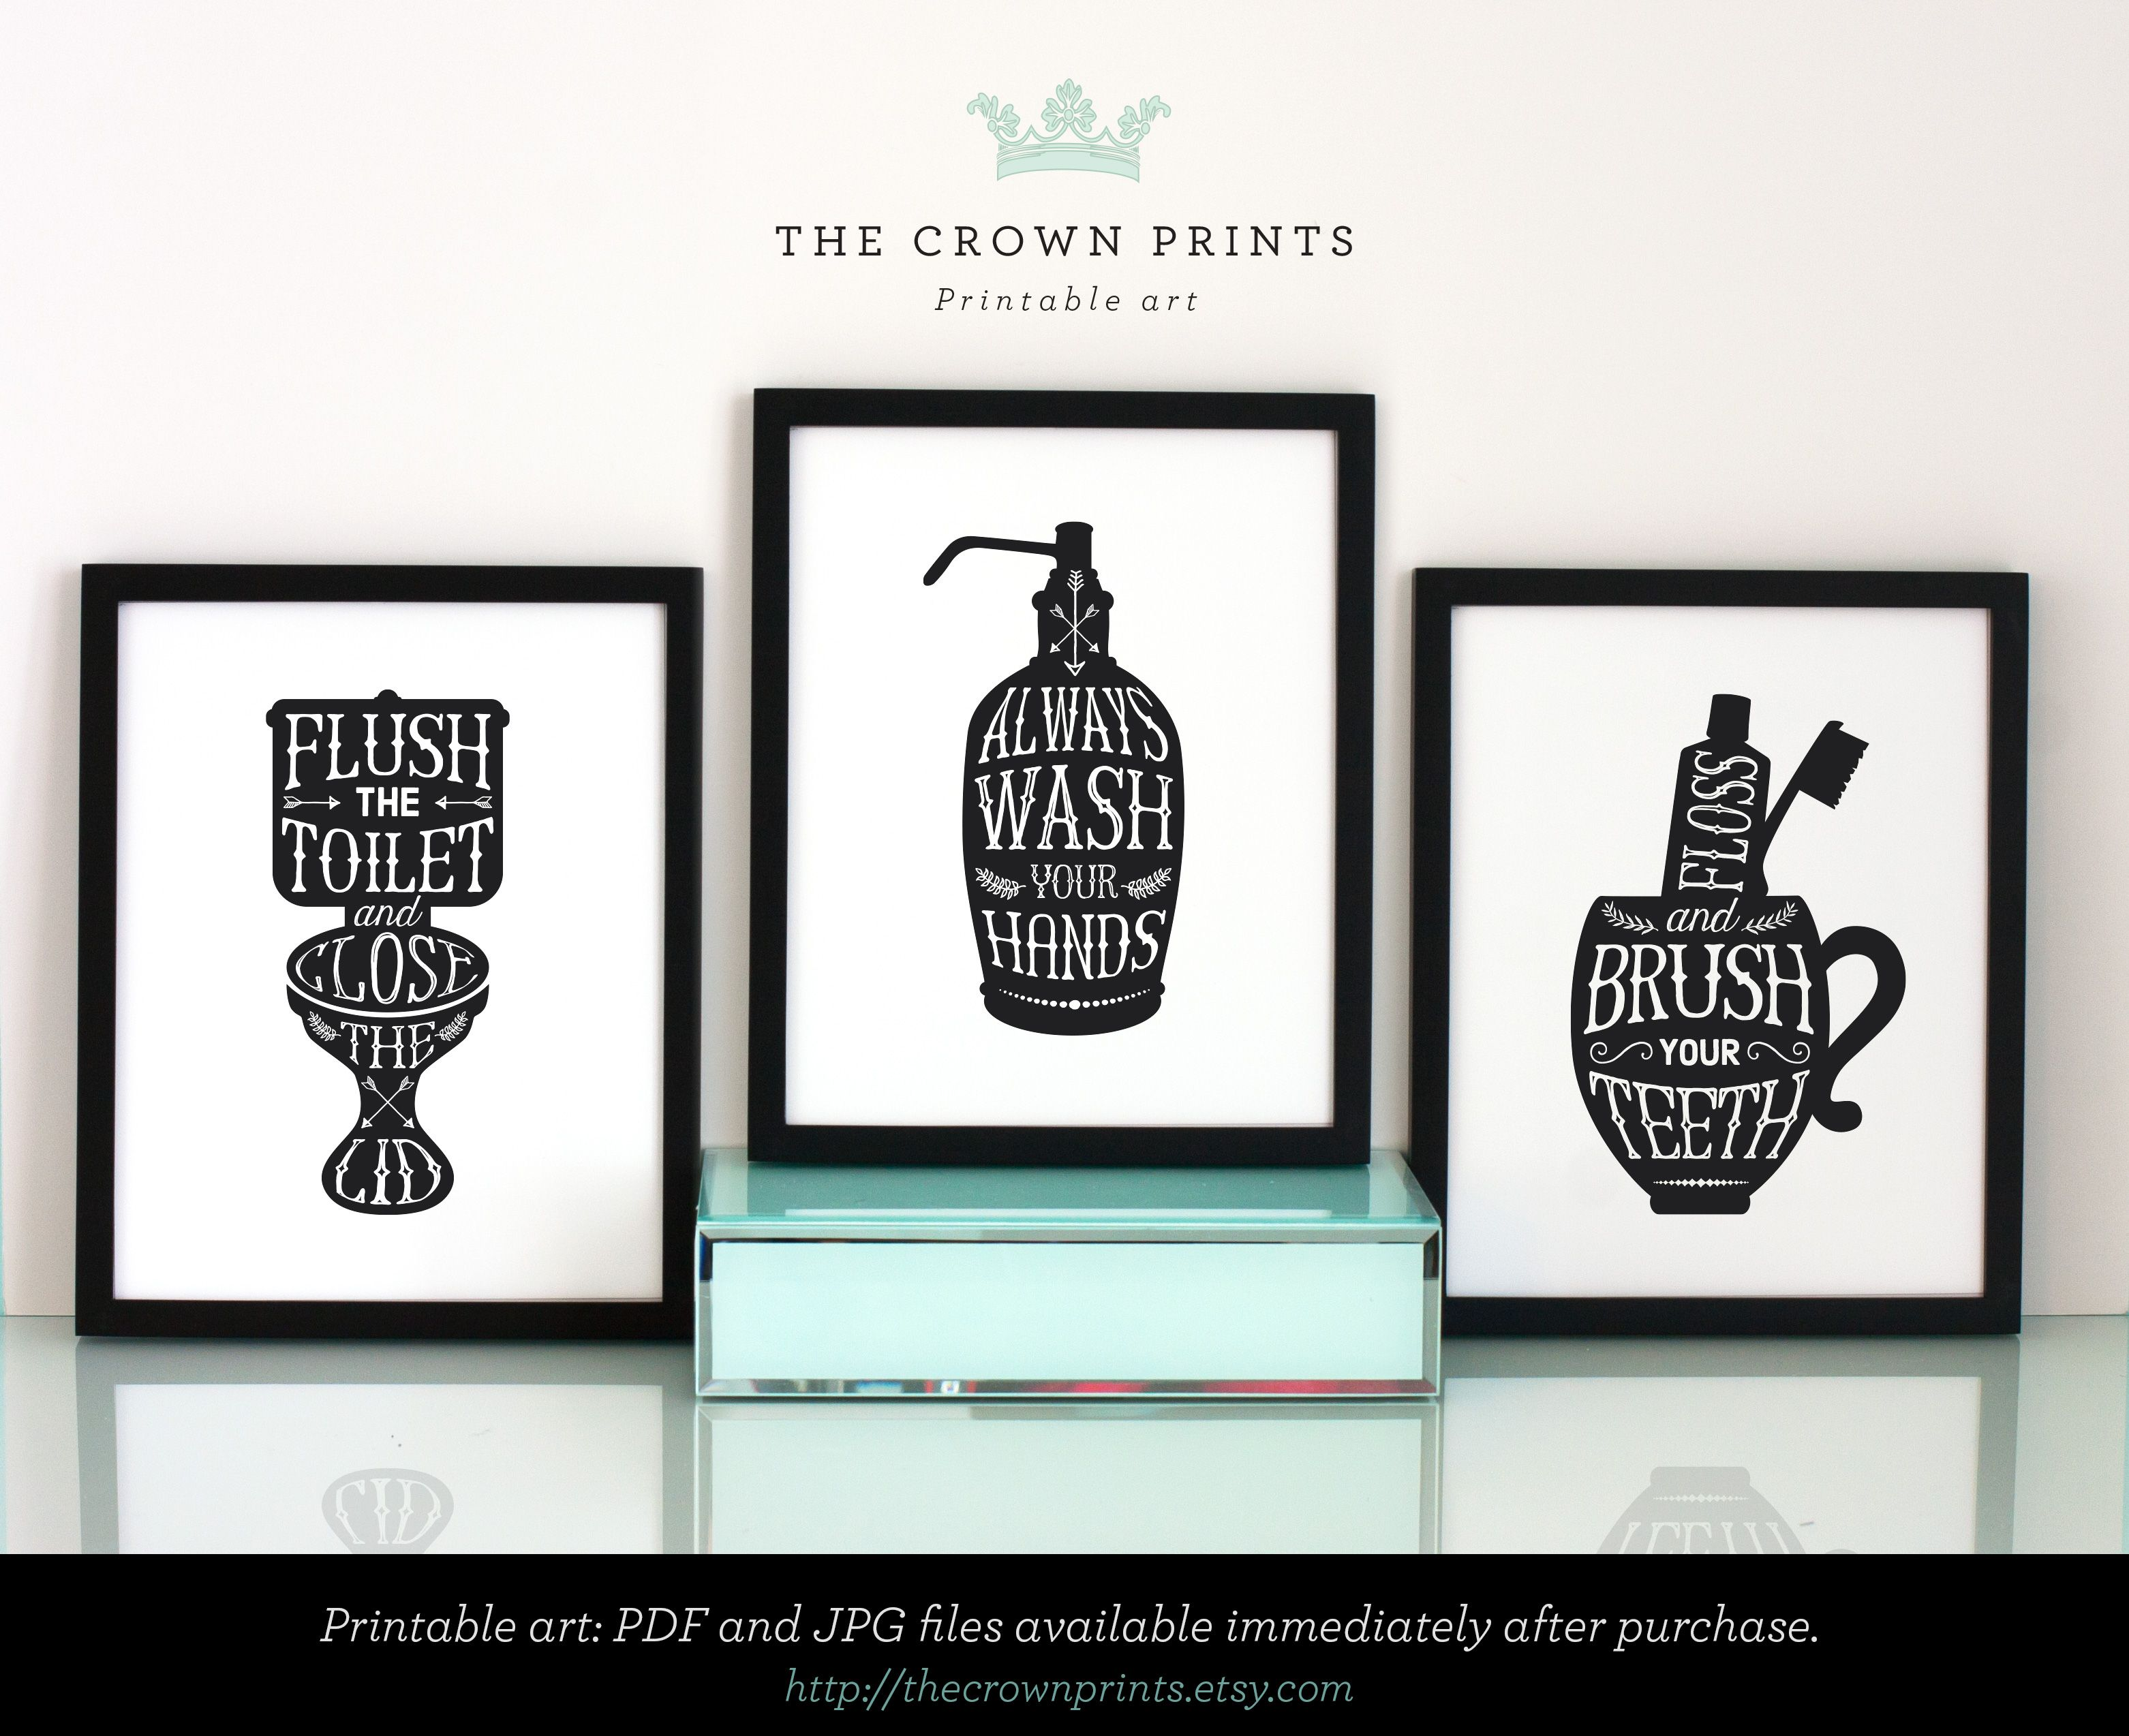 Bathroom Wall Decor, PRINTABLE ART, Gallery Prints Set Of